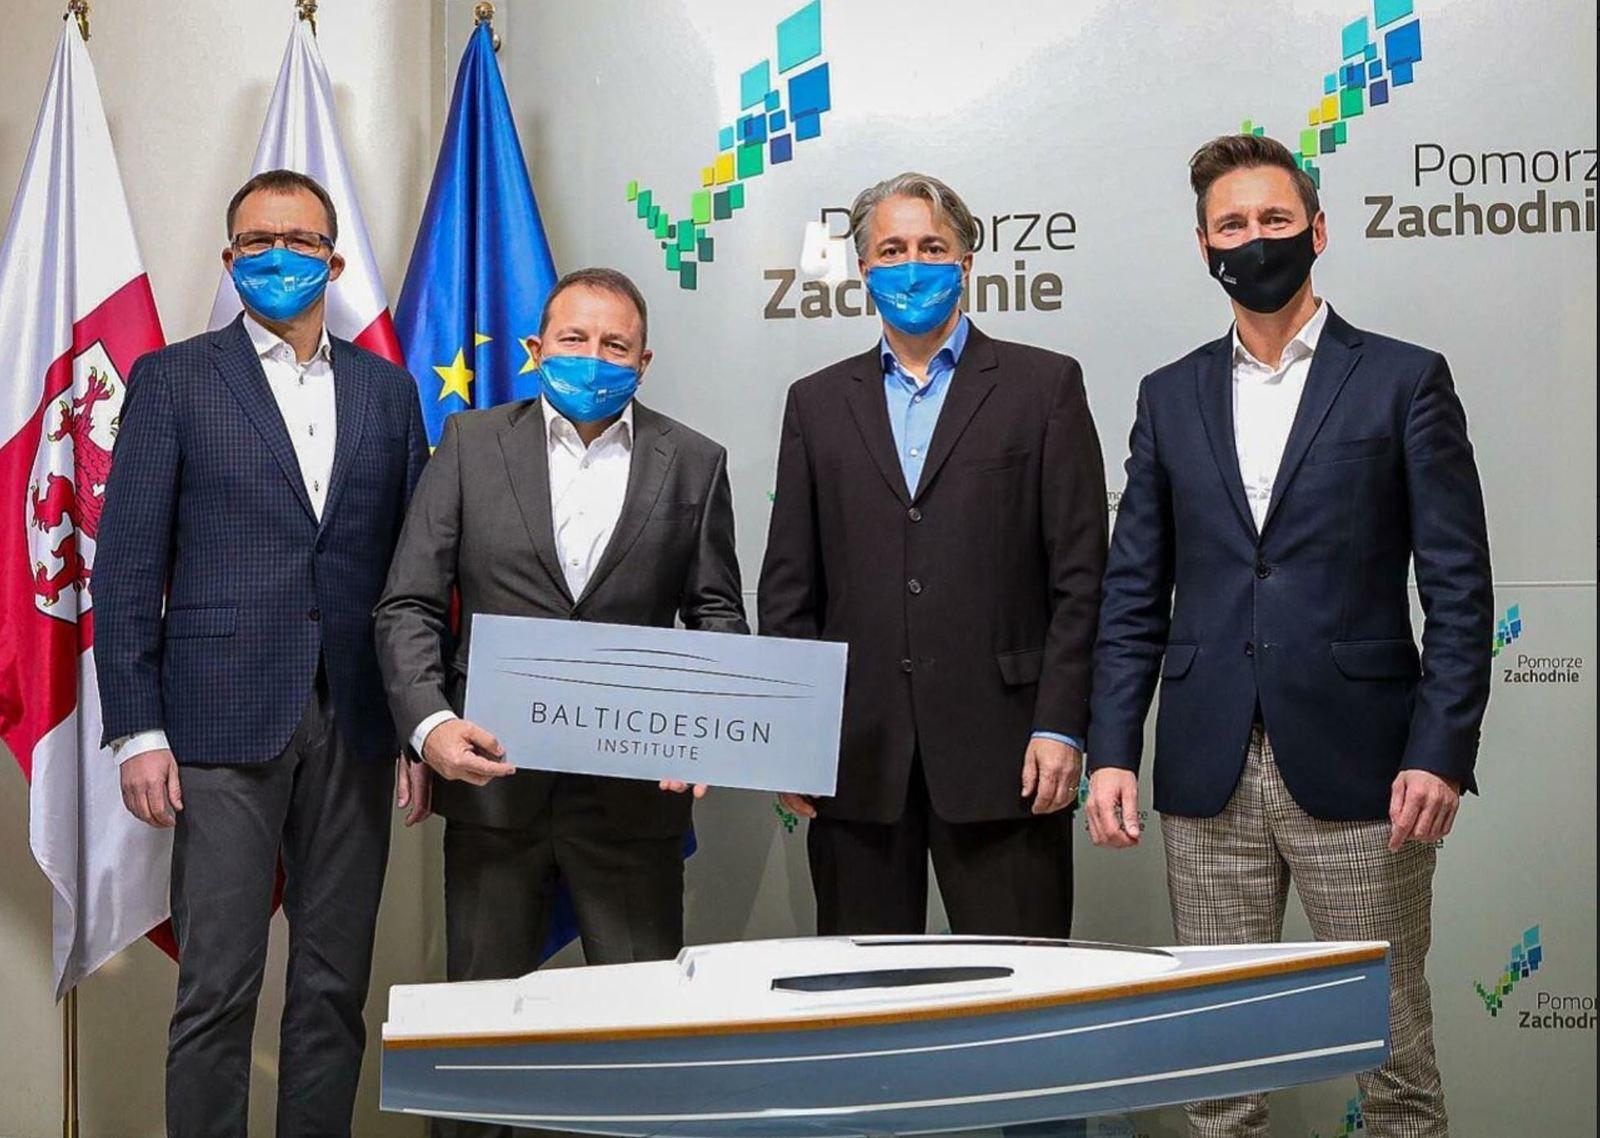 HanseYachts AG establishes the Balticdesign Institute in Poland